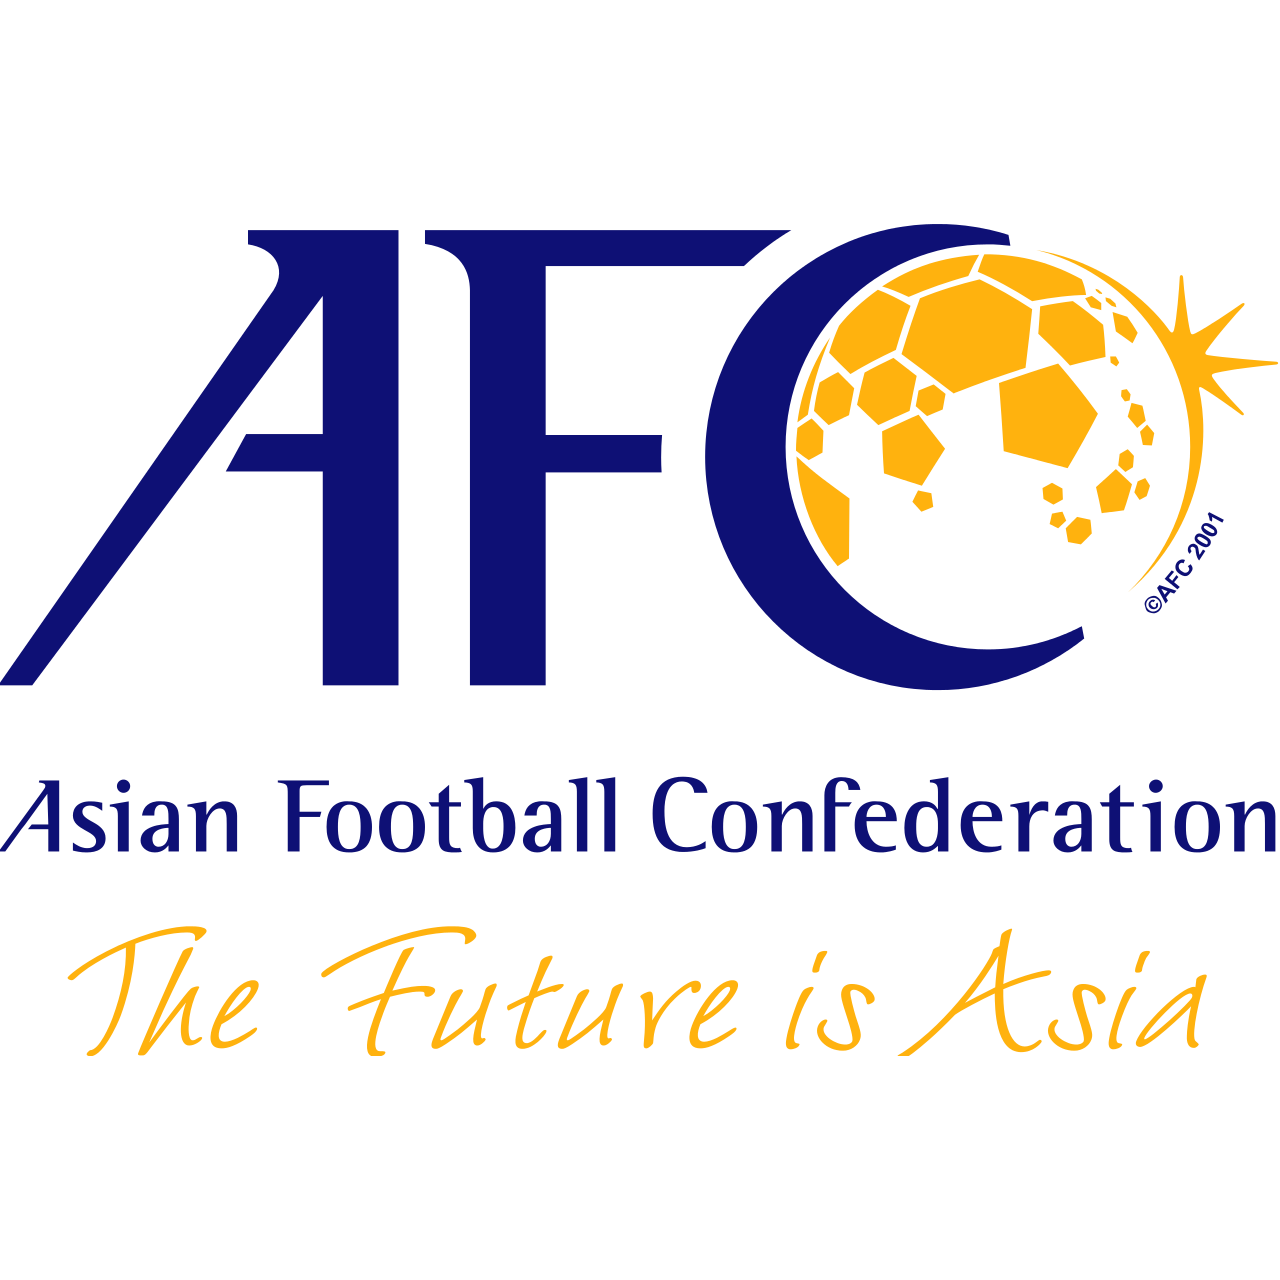 2015 AFC Football Asian Cup